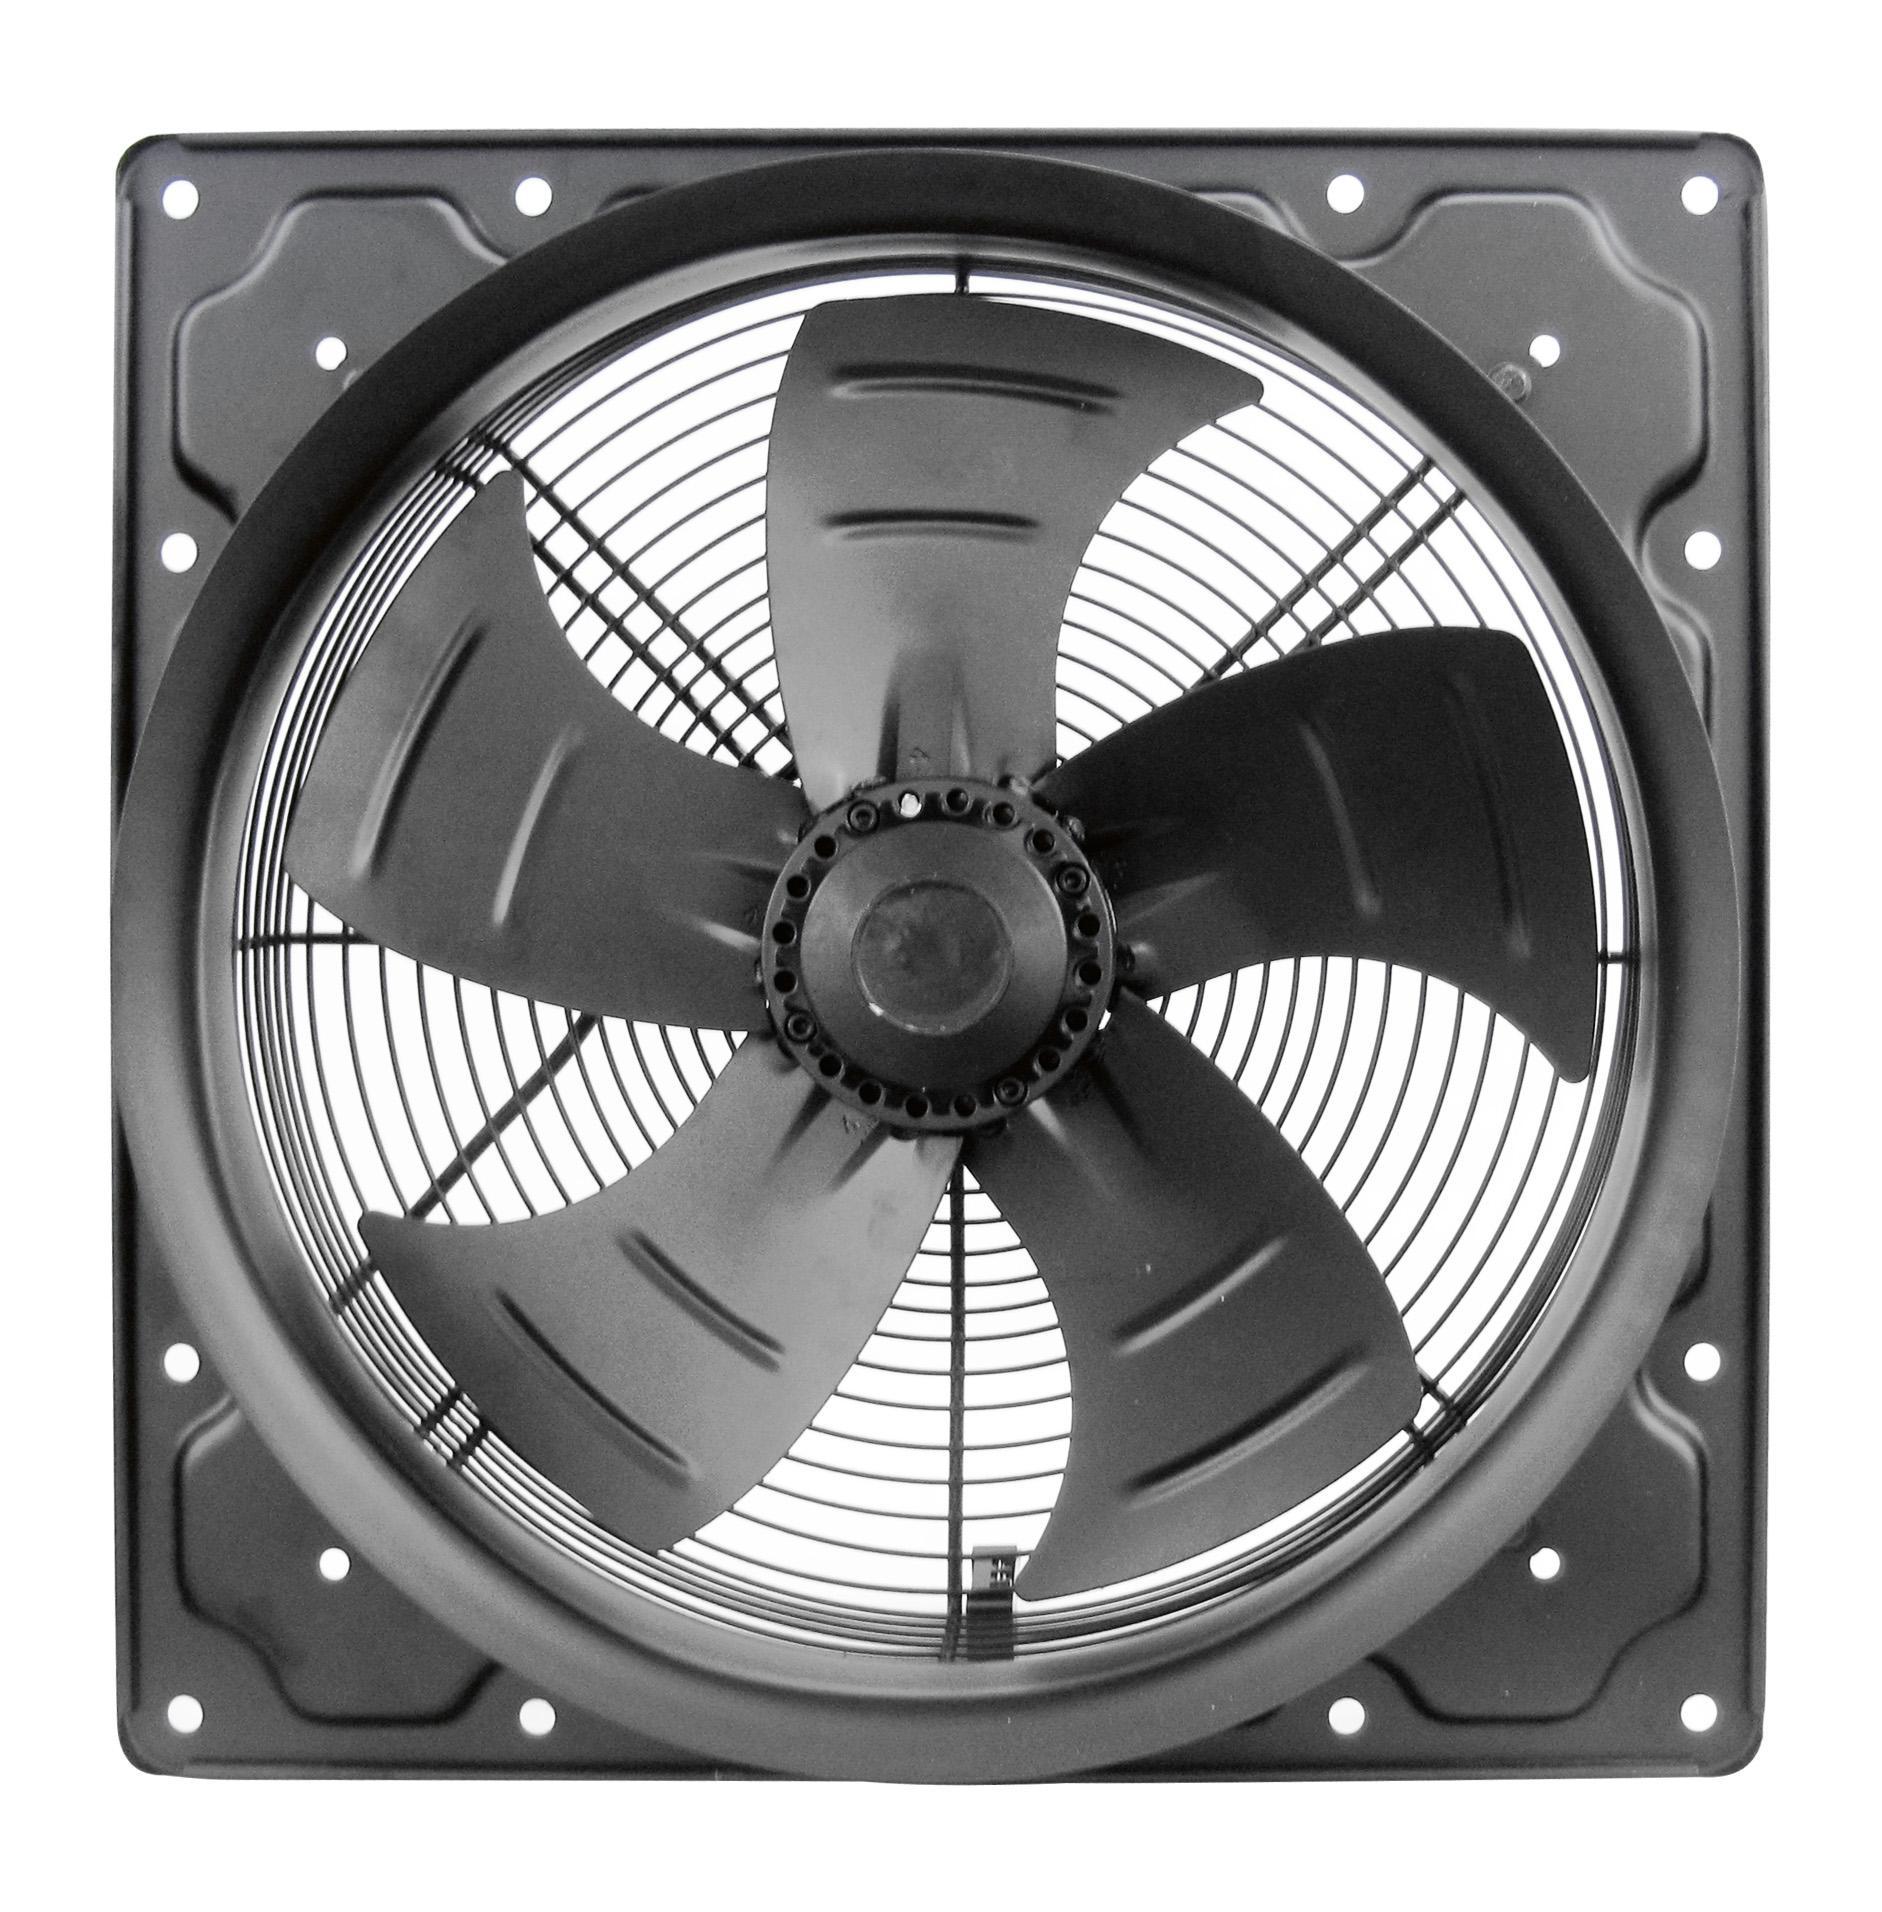 Promo Harga Panasonic Box Fan Fer303p2 Update 2018 Jam Tangan Wanita Charles Jourdan Cj1002 2552 Rose Gold Original Exhaust 6 Inch Fv15tgu Garansi Resmi Spec Cke Luxury Outer Rotor 16